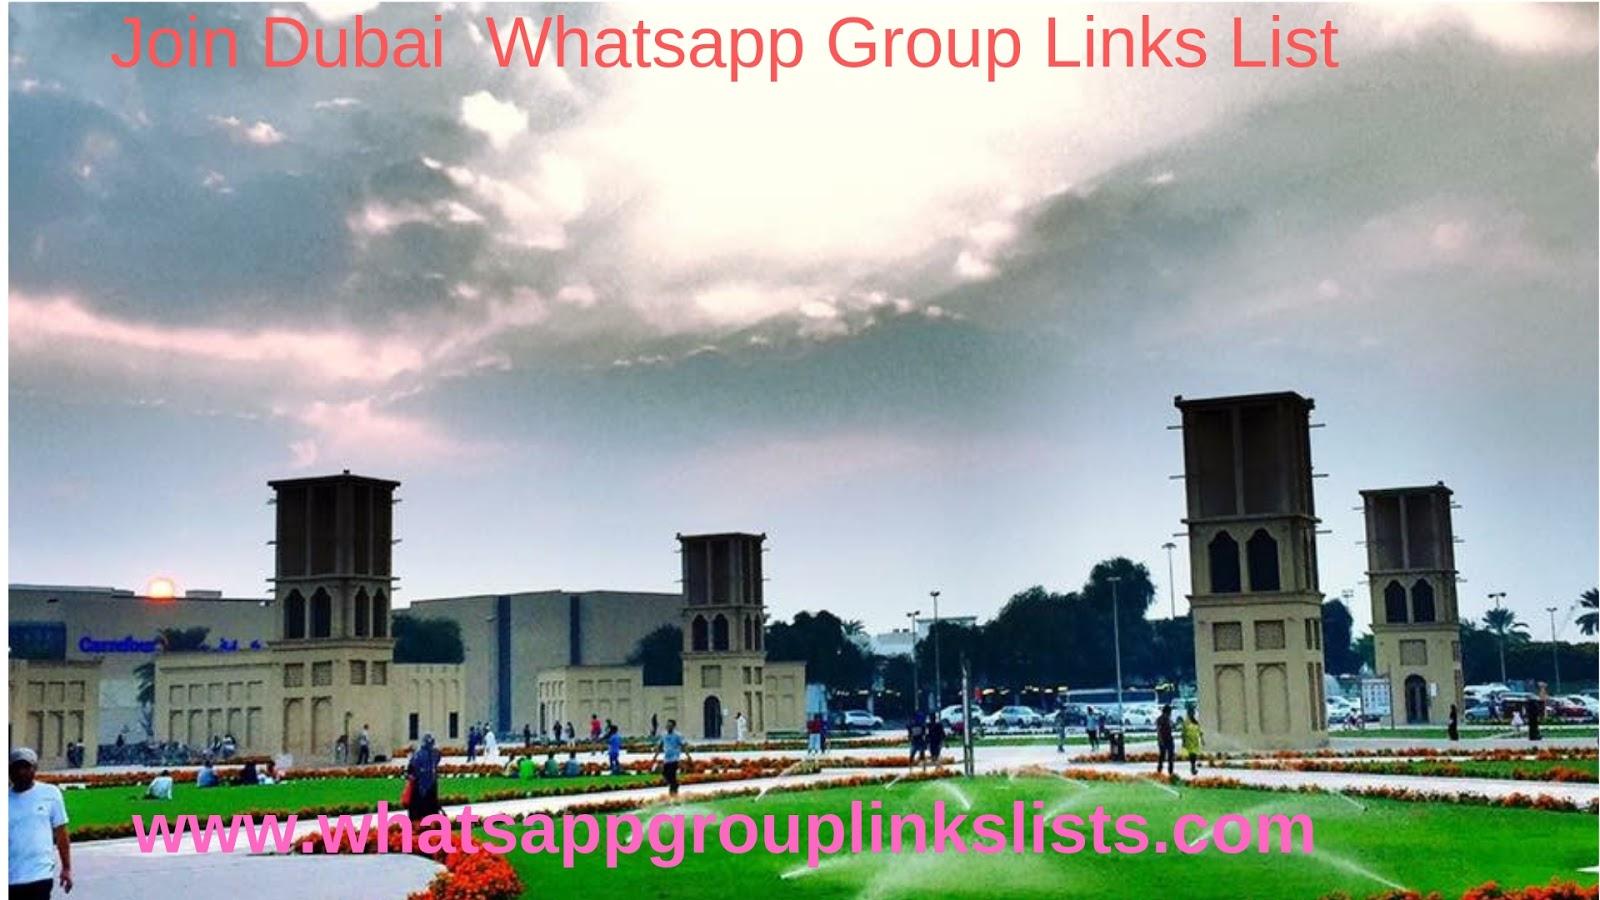 Join Dubai Whatsapp Group Links List